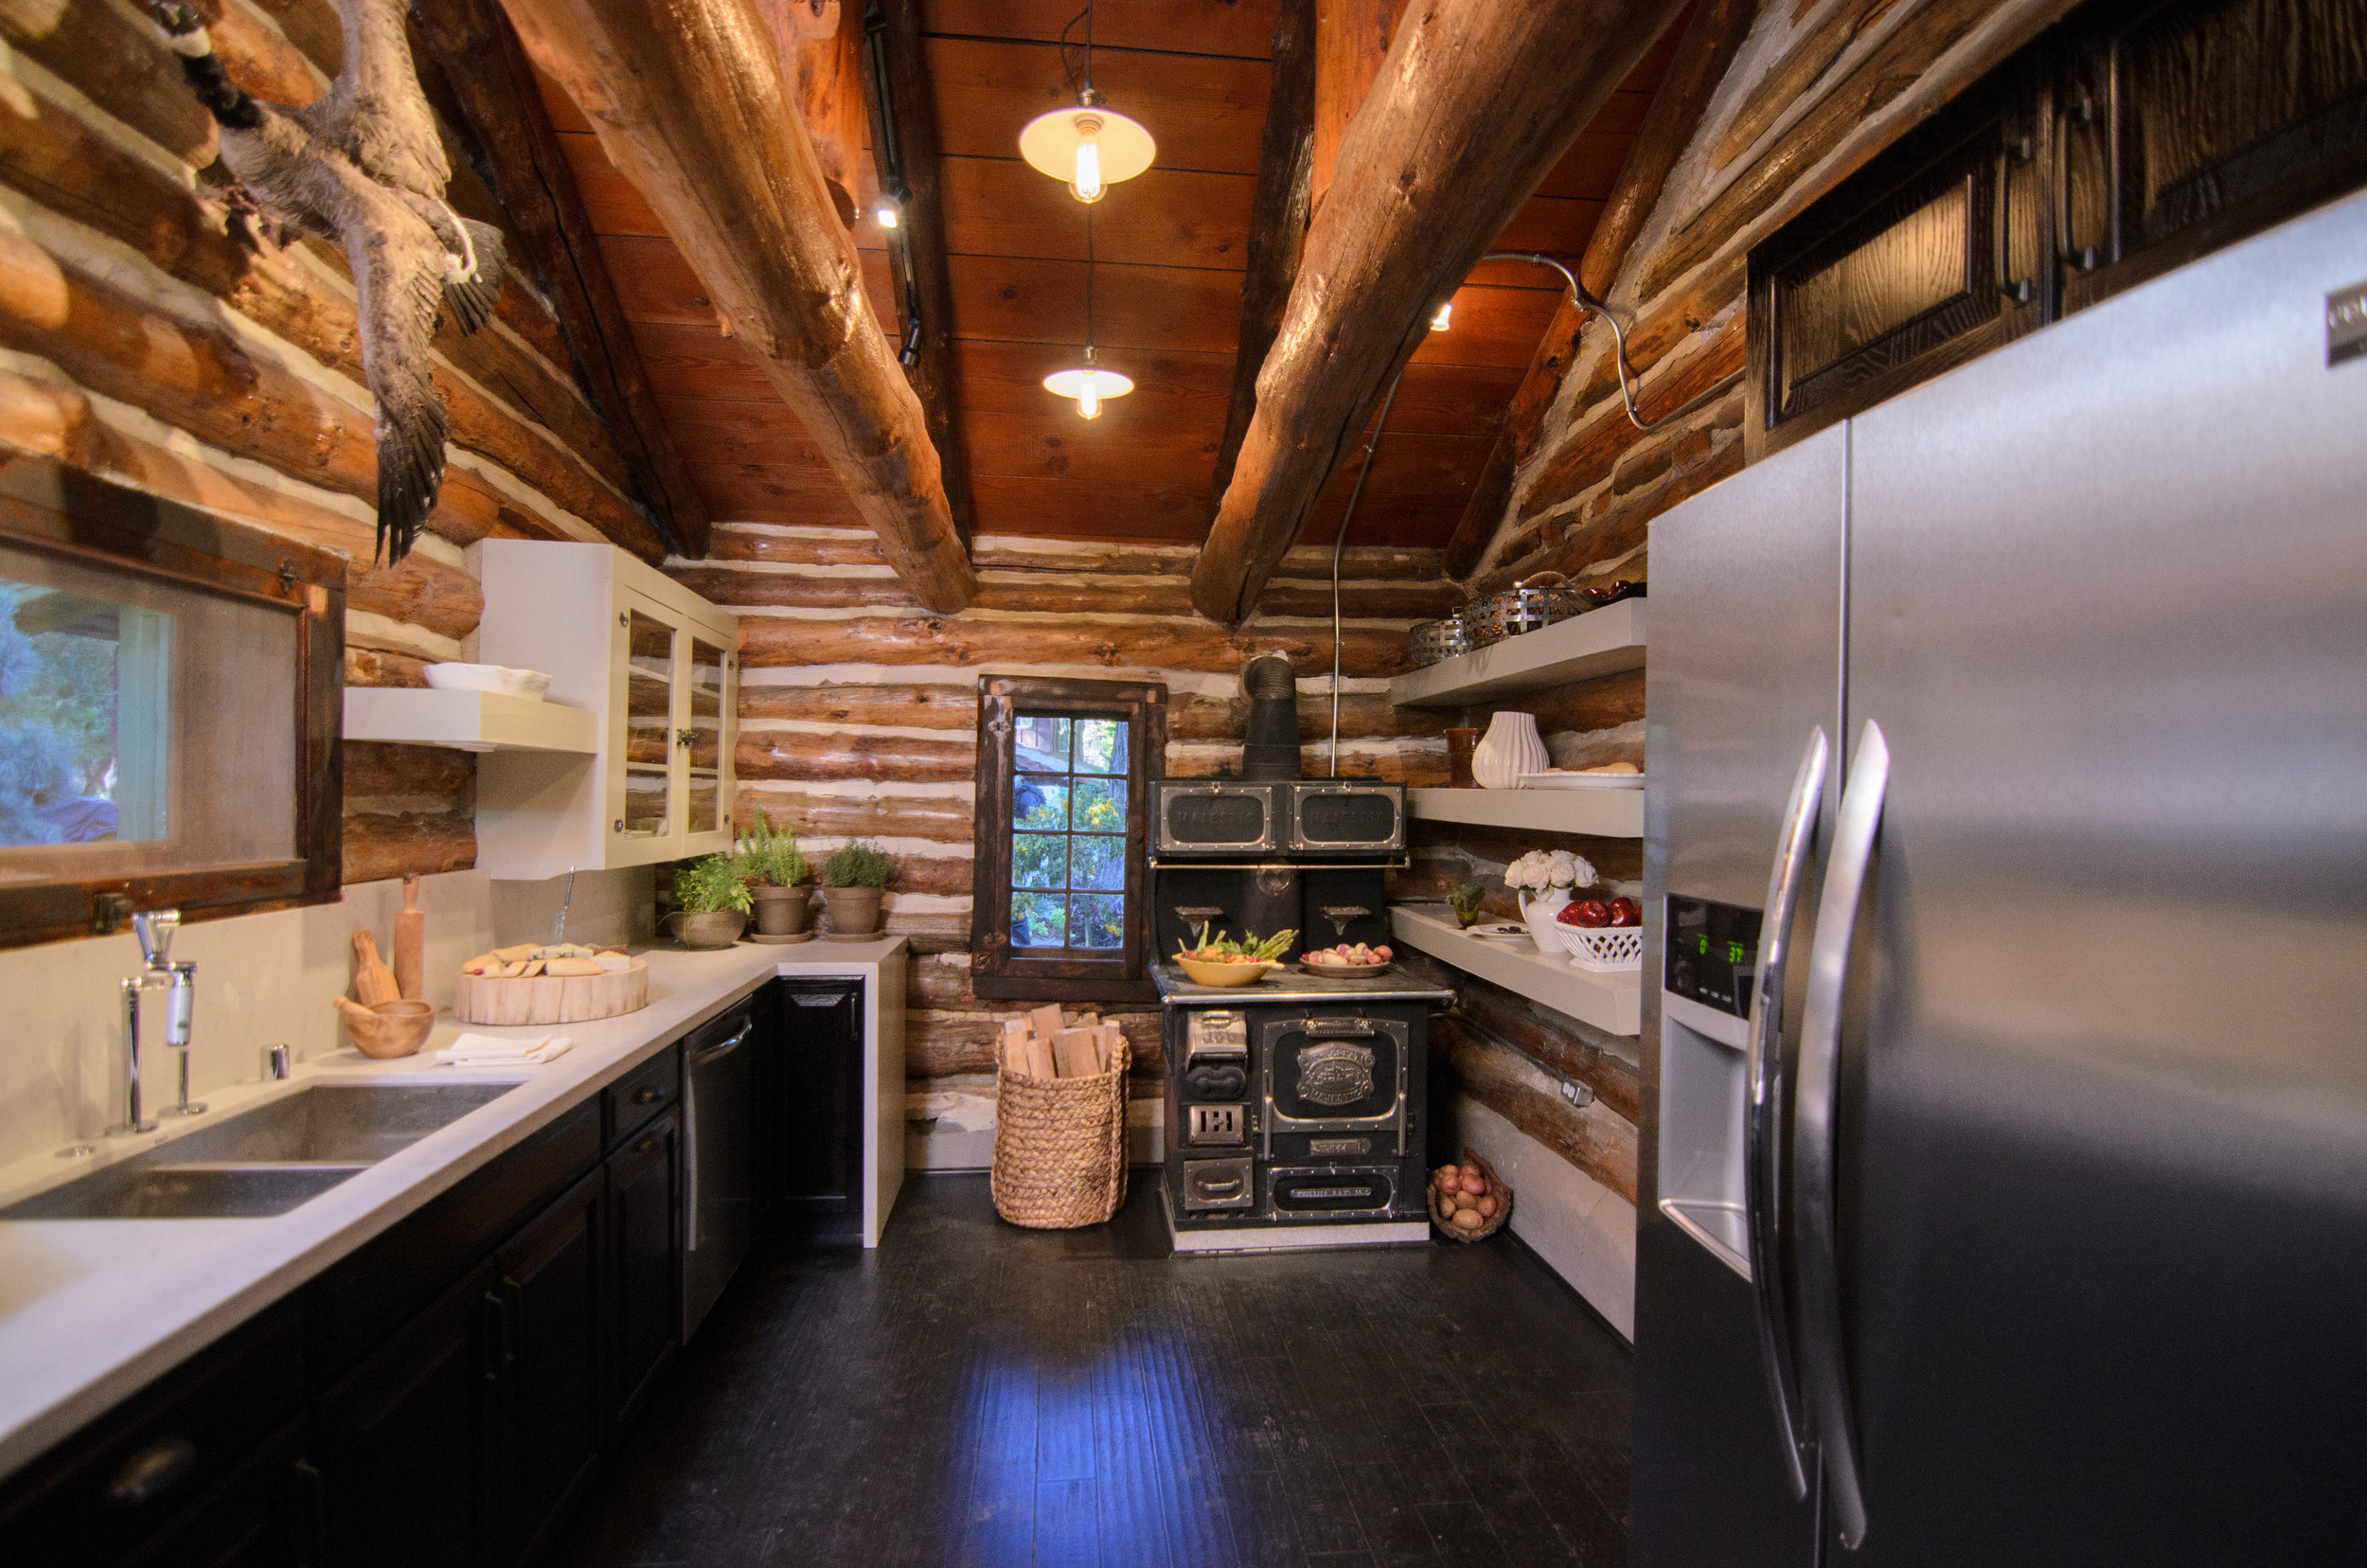 AmericanDreamBuilders-Ep4-Red-Kitchen.jpg